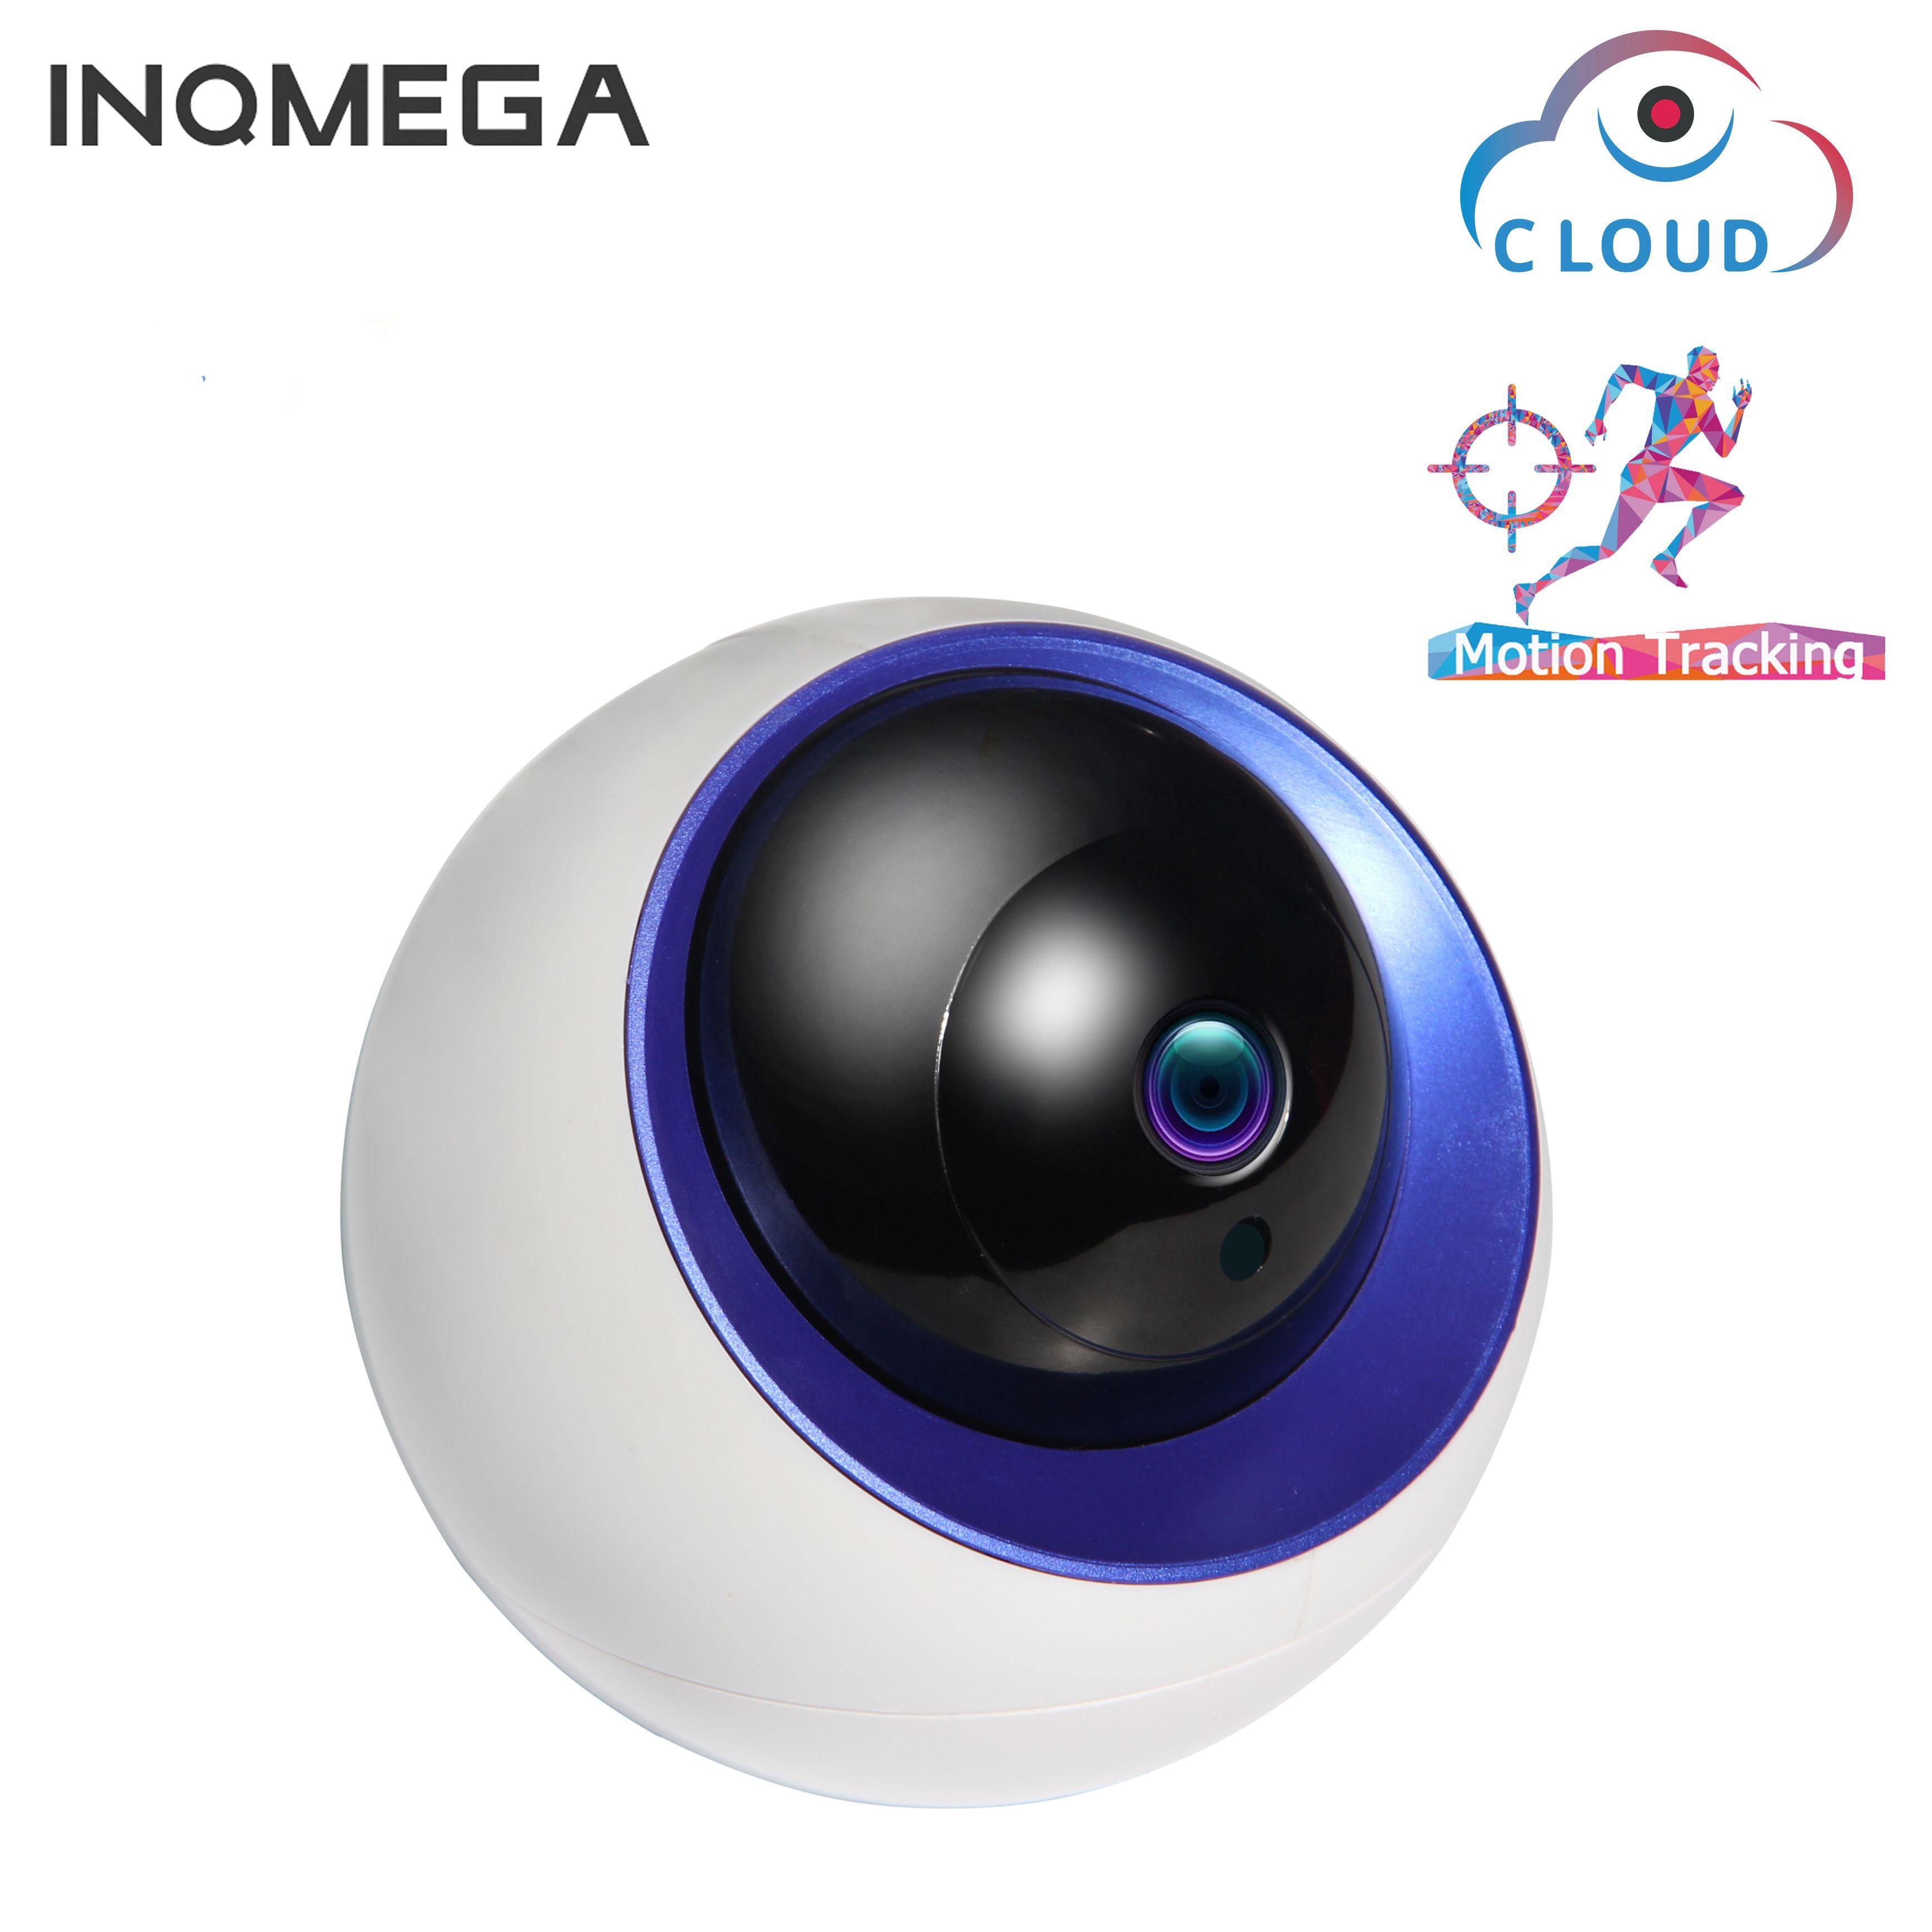 INQMEGA Wolke IP Dome Kamera Auto Tracking 4MP 1080 P Indoor Hause Sicherheit Überwachung CCTV Kamera Infrarot/Audio/ alarm/Pan/Tilt